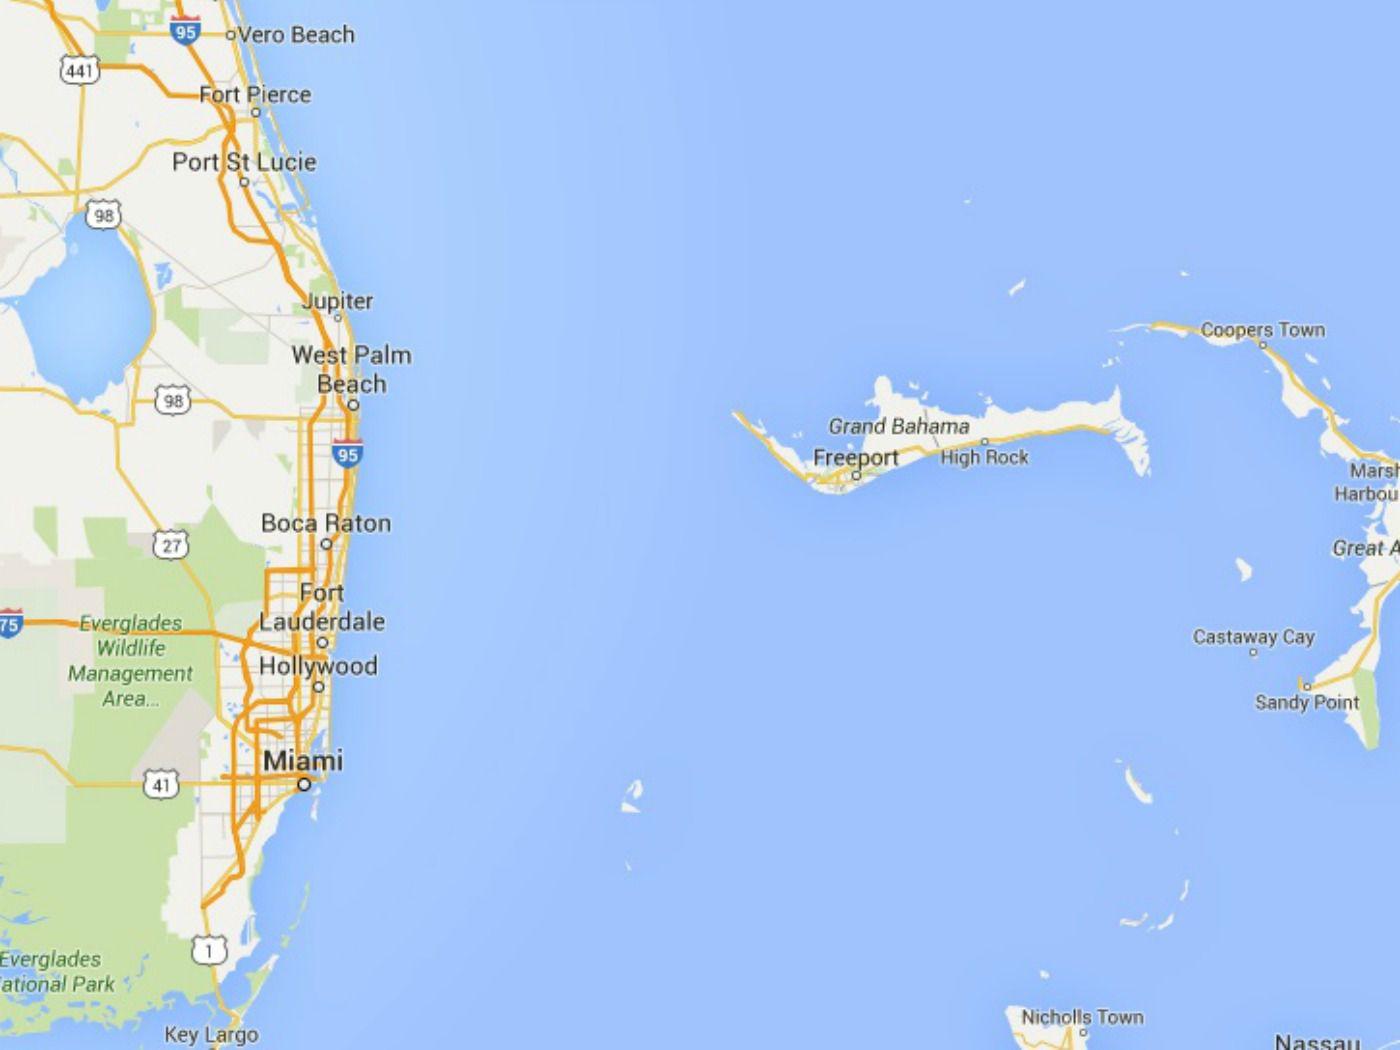 Maps Of Florida Orlando Tampa Miami Keys And More - Boca raton florida map